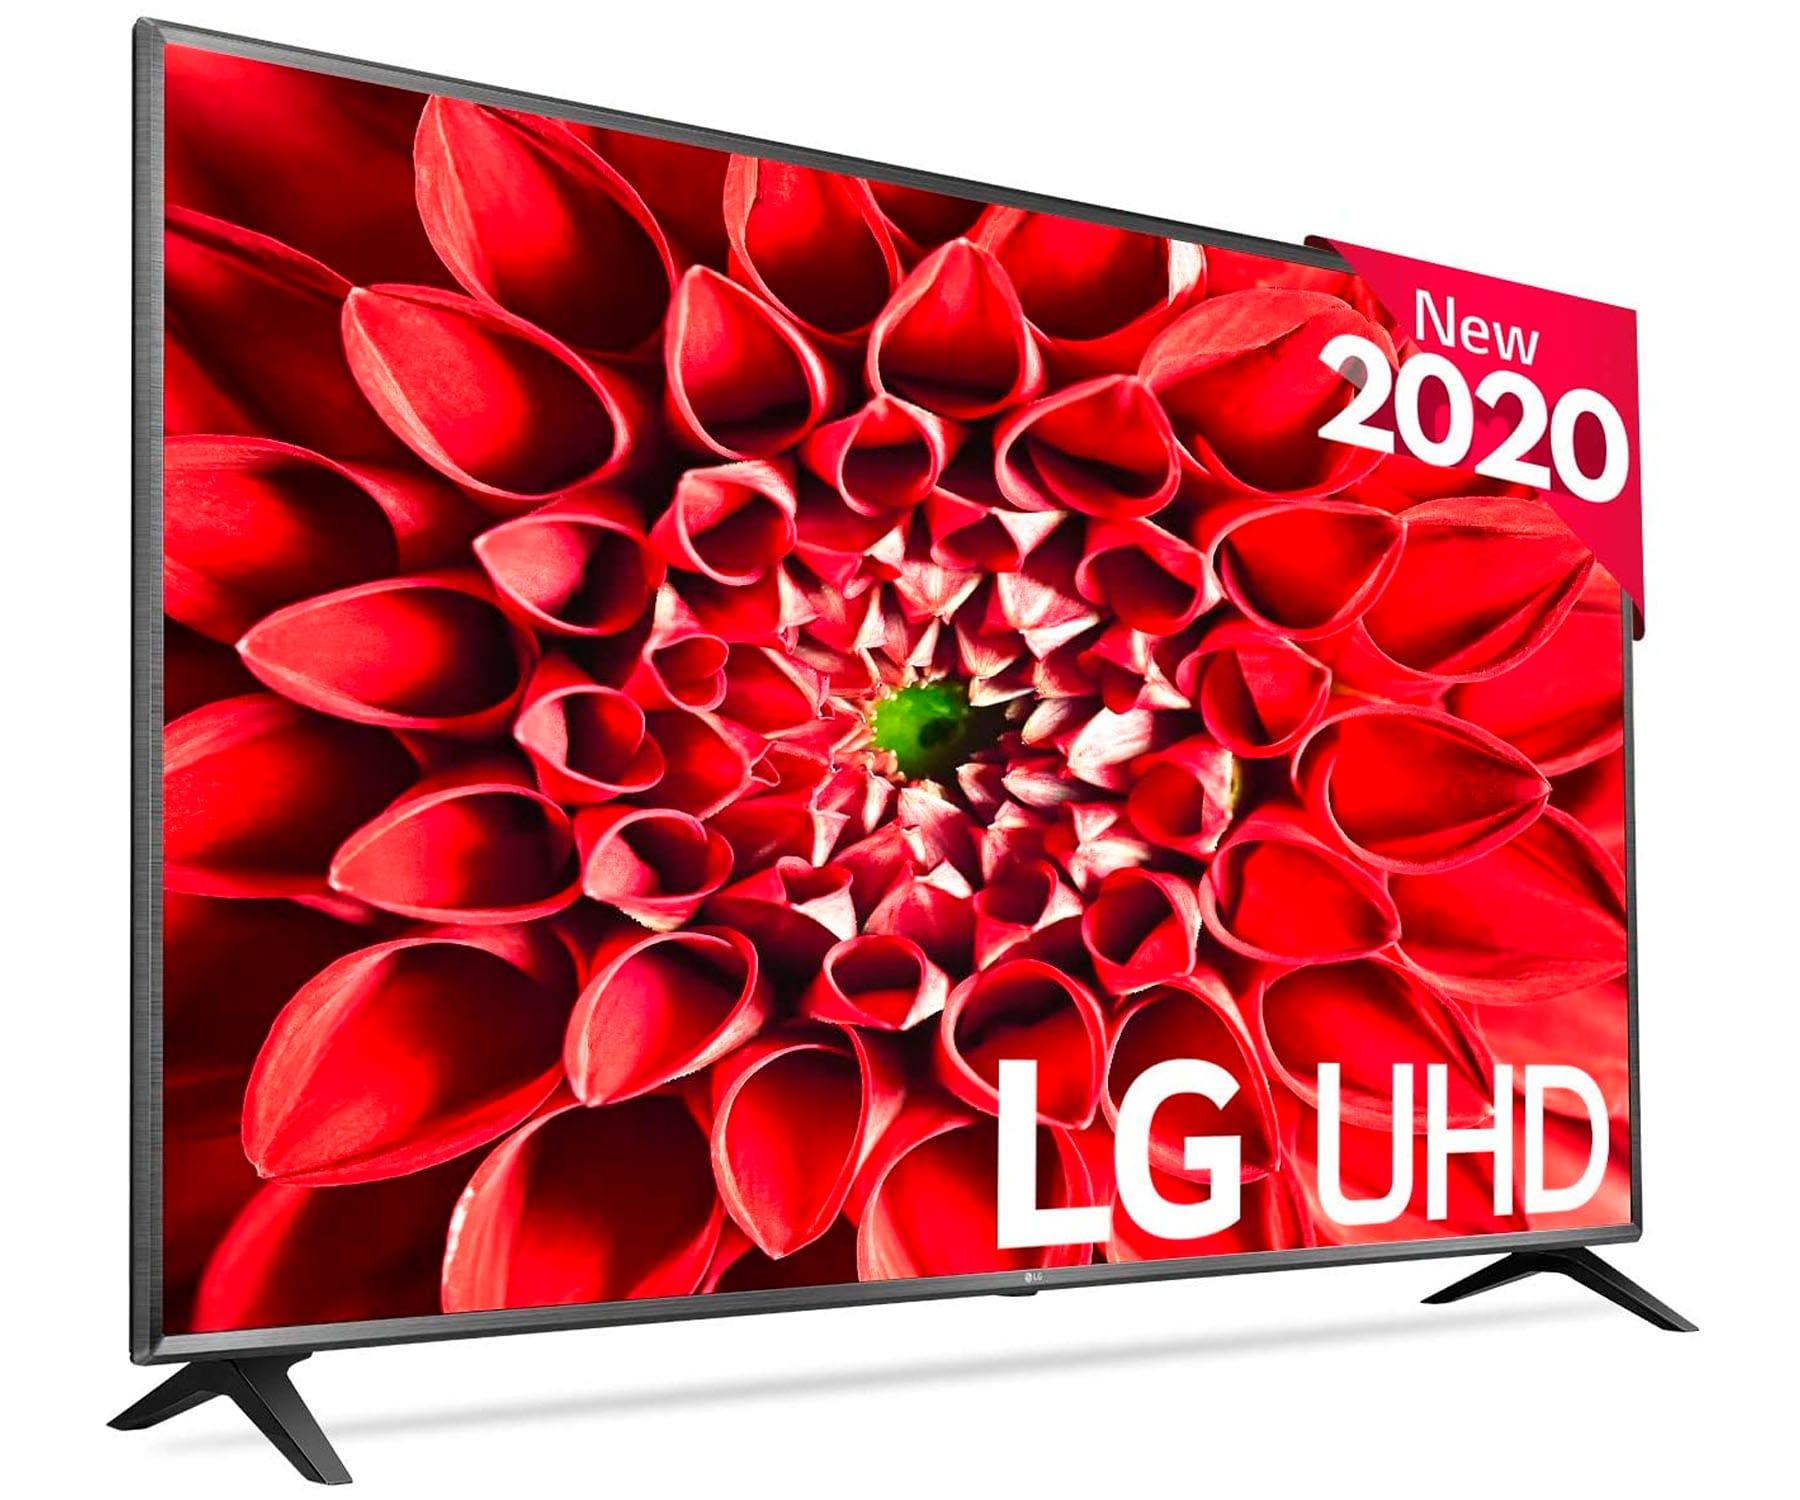 LG 70UN71006LA TELEVISOR 70'' IPS LED UHD 4K SMART TV WEBOS 5.0 WIFI HDMI BLUETOOTH